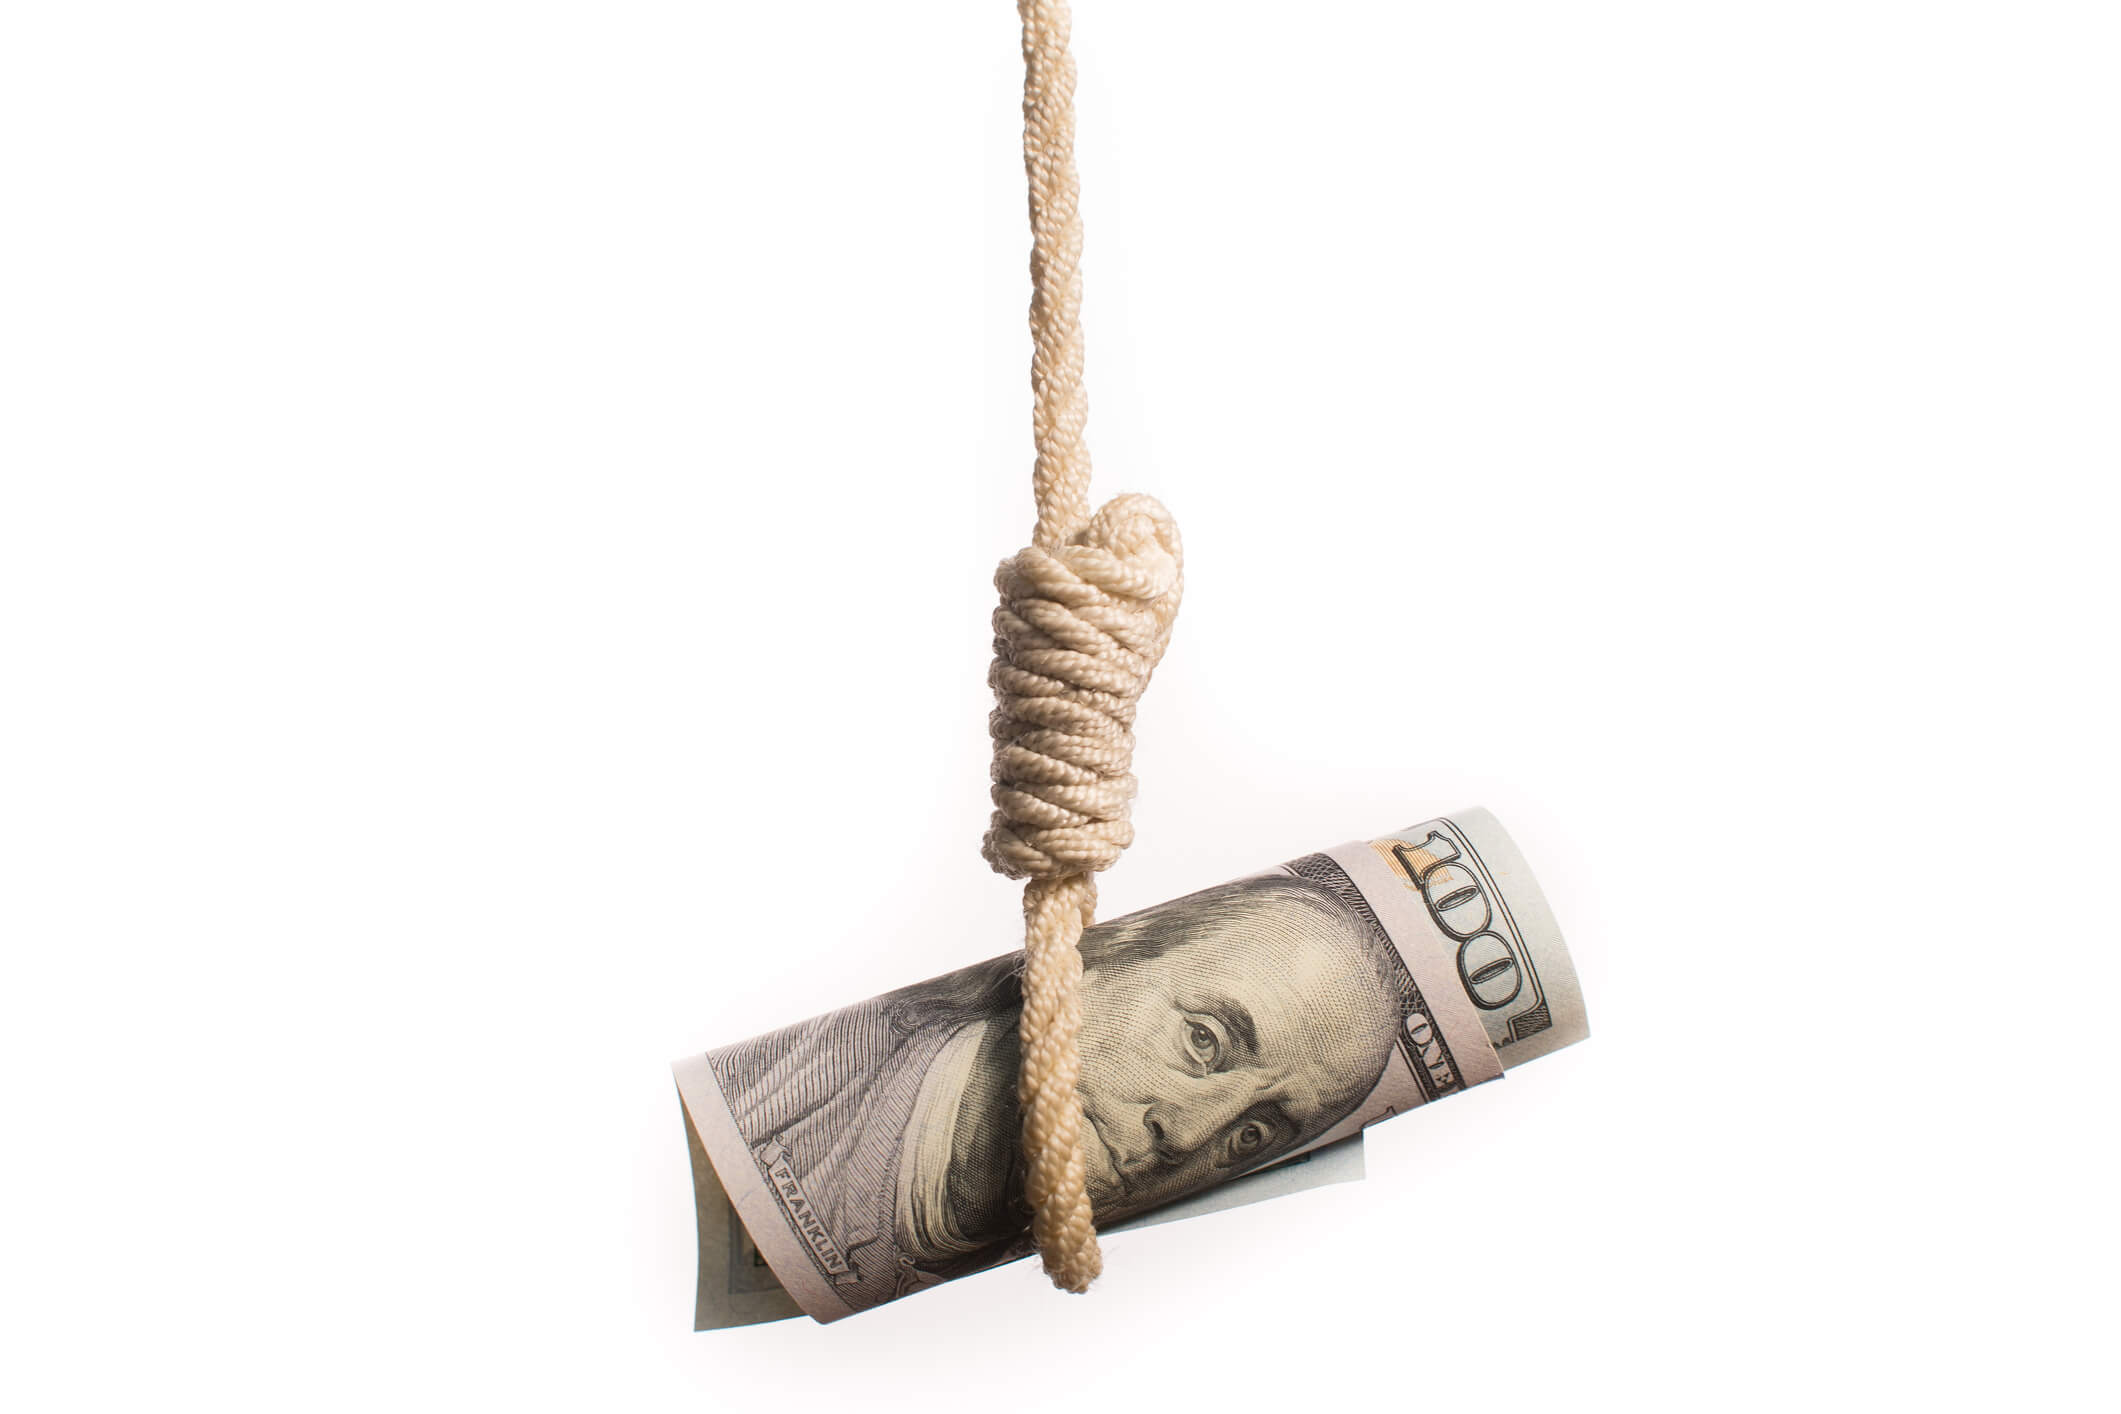 tighten noose fraud - Complete Controller